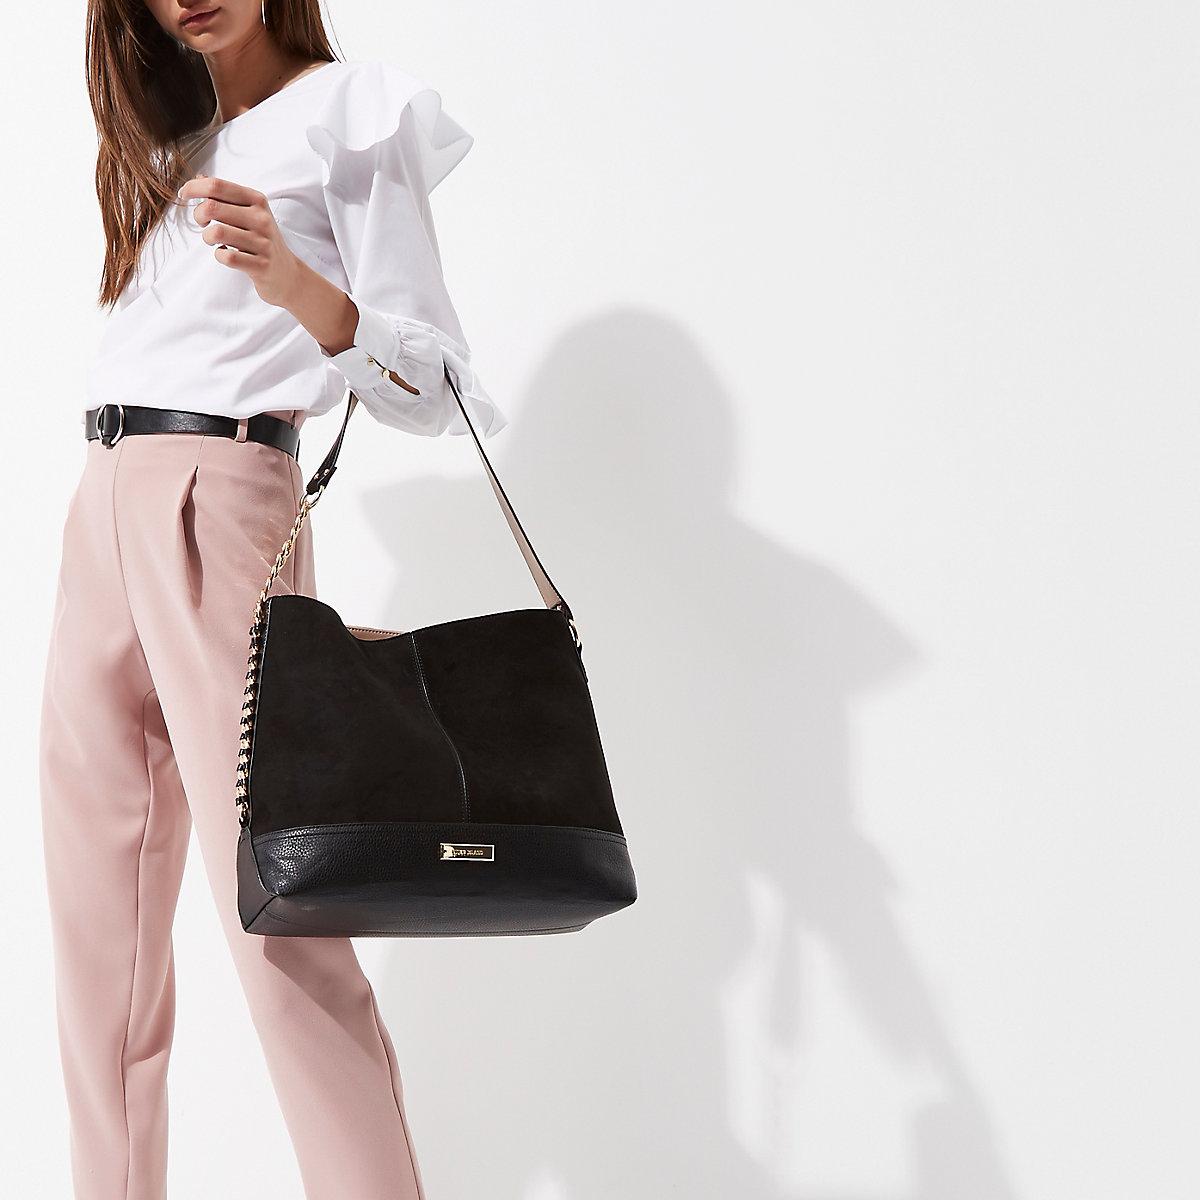 Black chain side slouch bag - Shopper   Tote Bags - Bags   Purses ... 879bcb31d298e